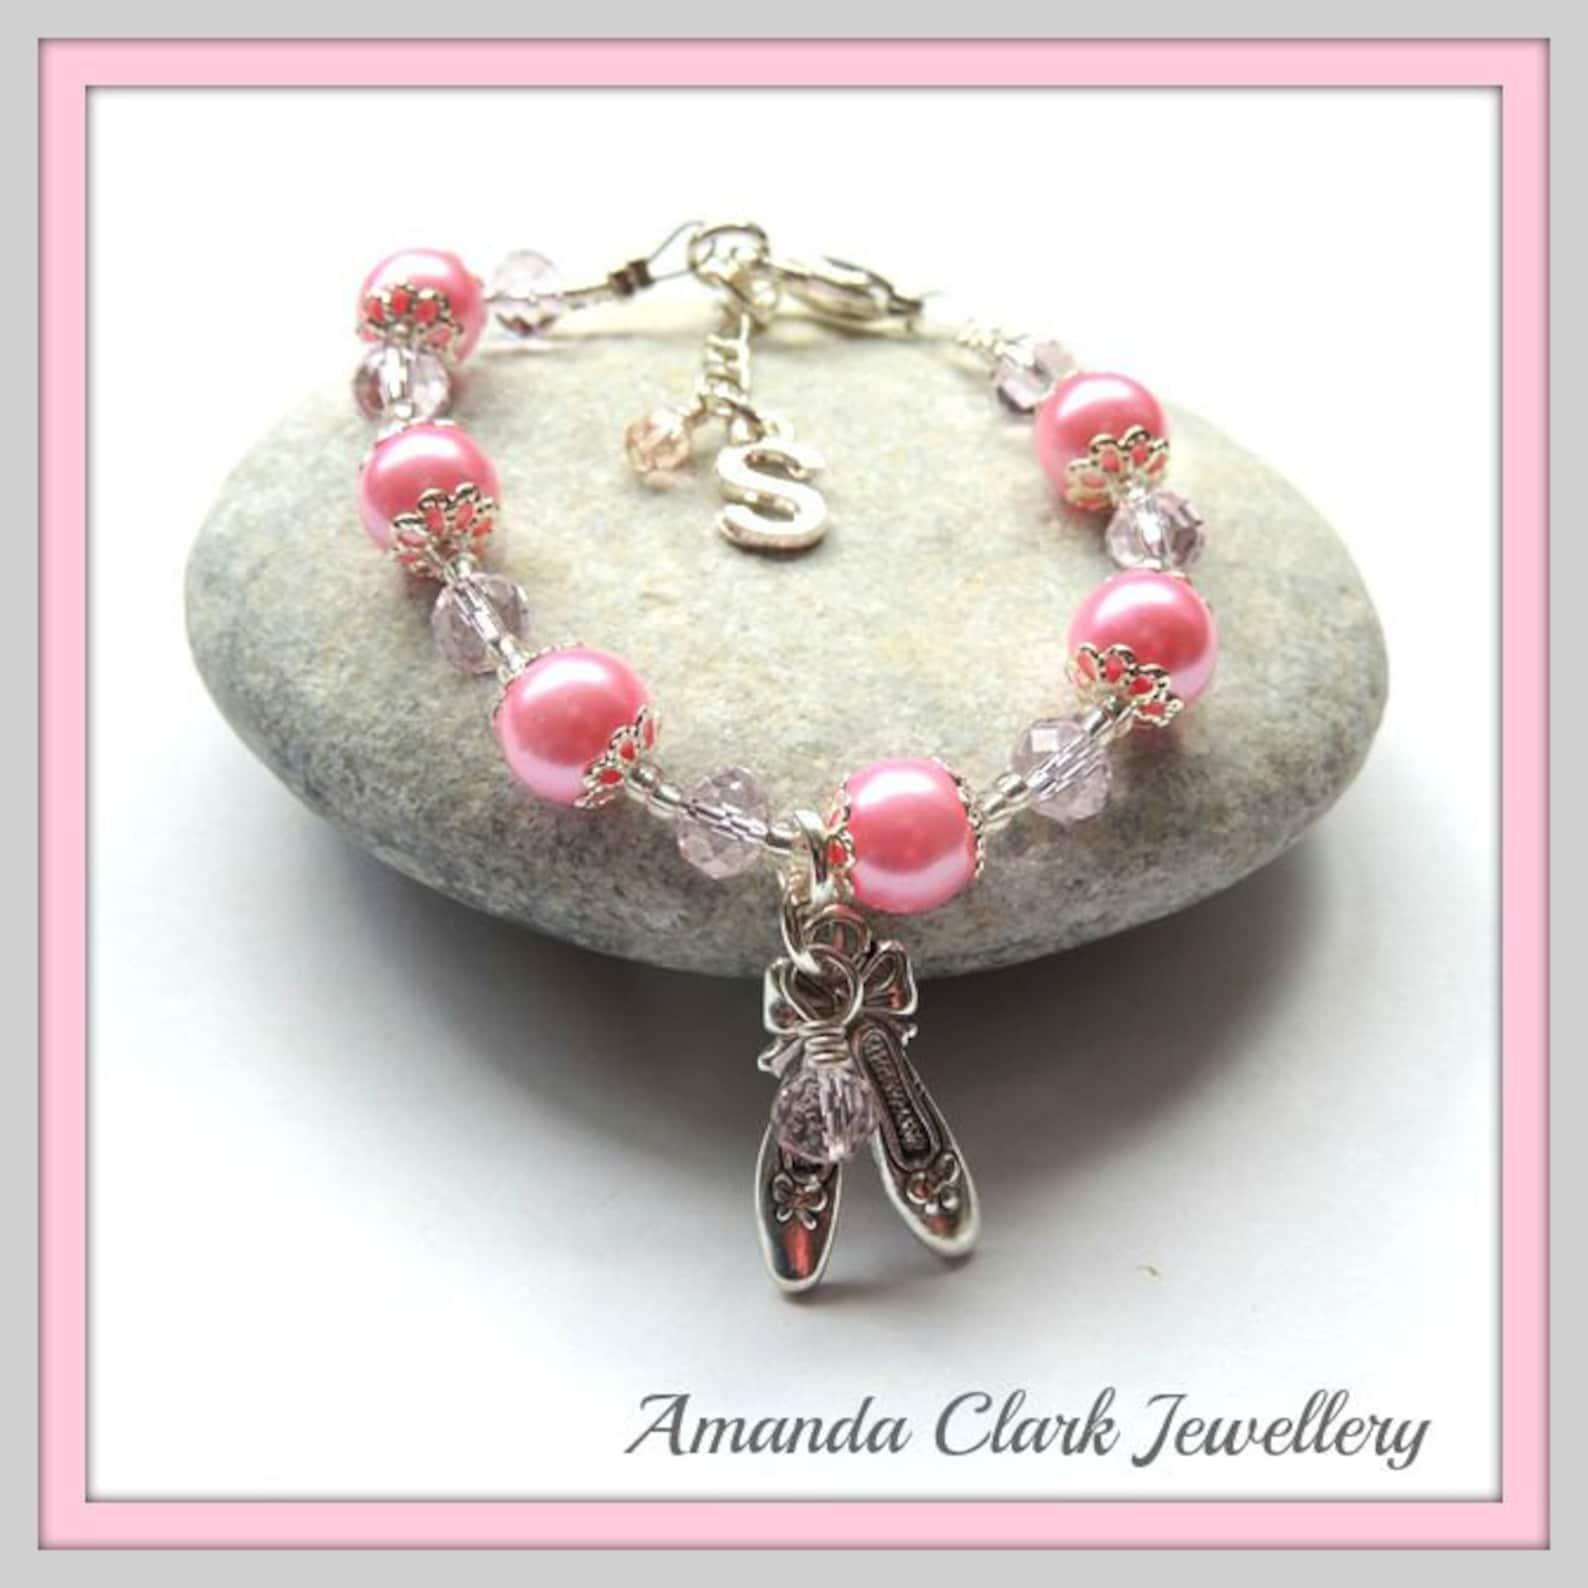 personalised pink ballet shoes bracelet   bridesmaid bracelet   personalised flower girl bracelet   ballet charm bracelet  gifts